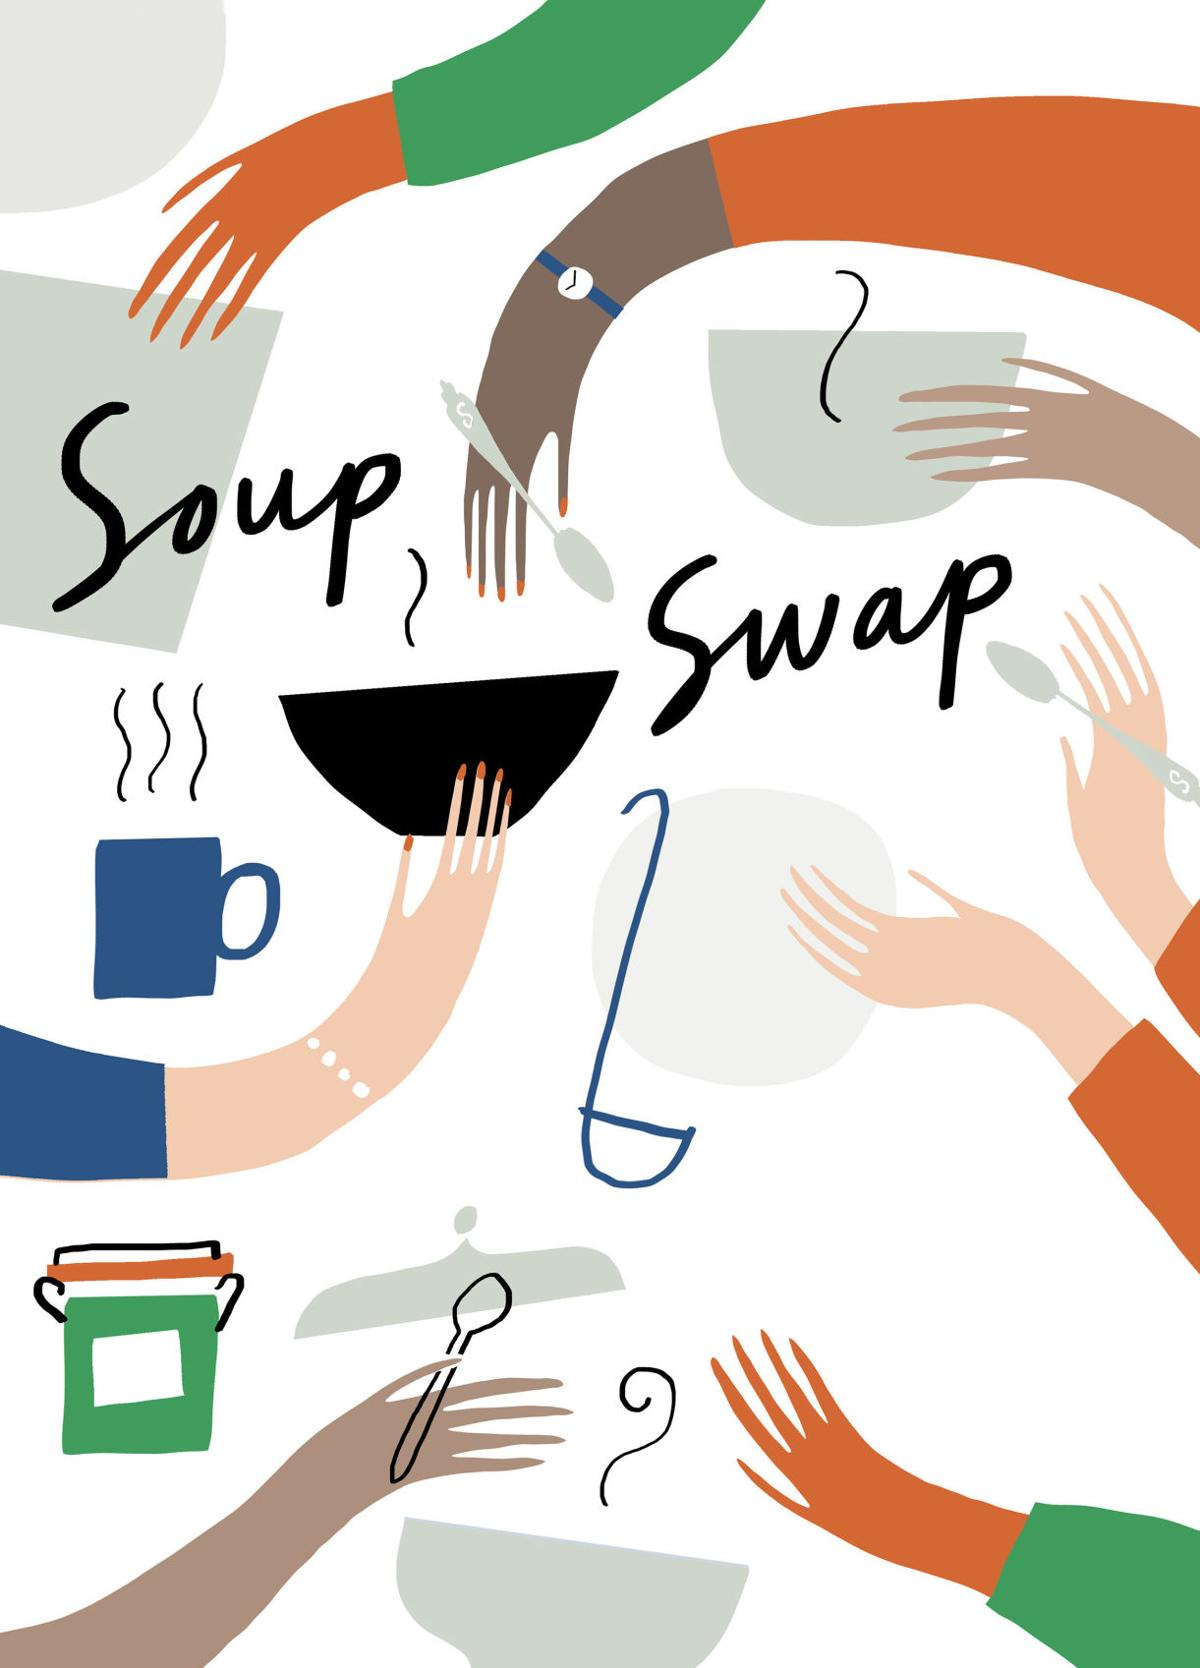 MOMS-SOUP-SWAP-PARTY-MCT